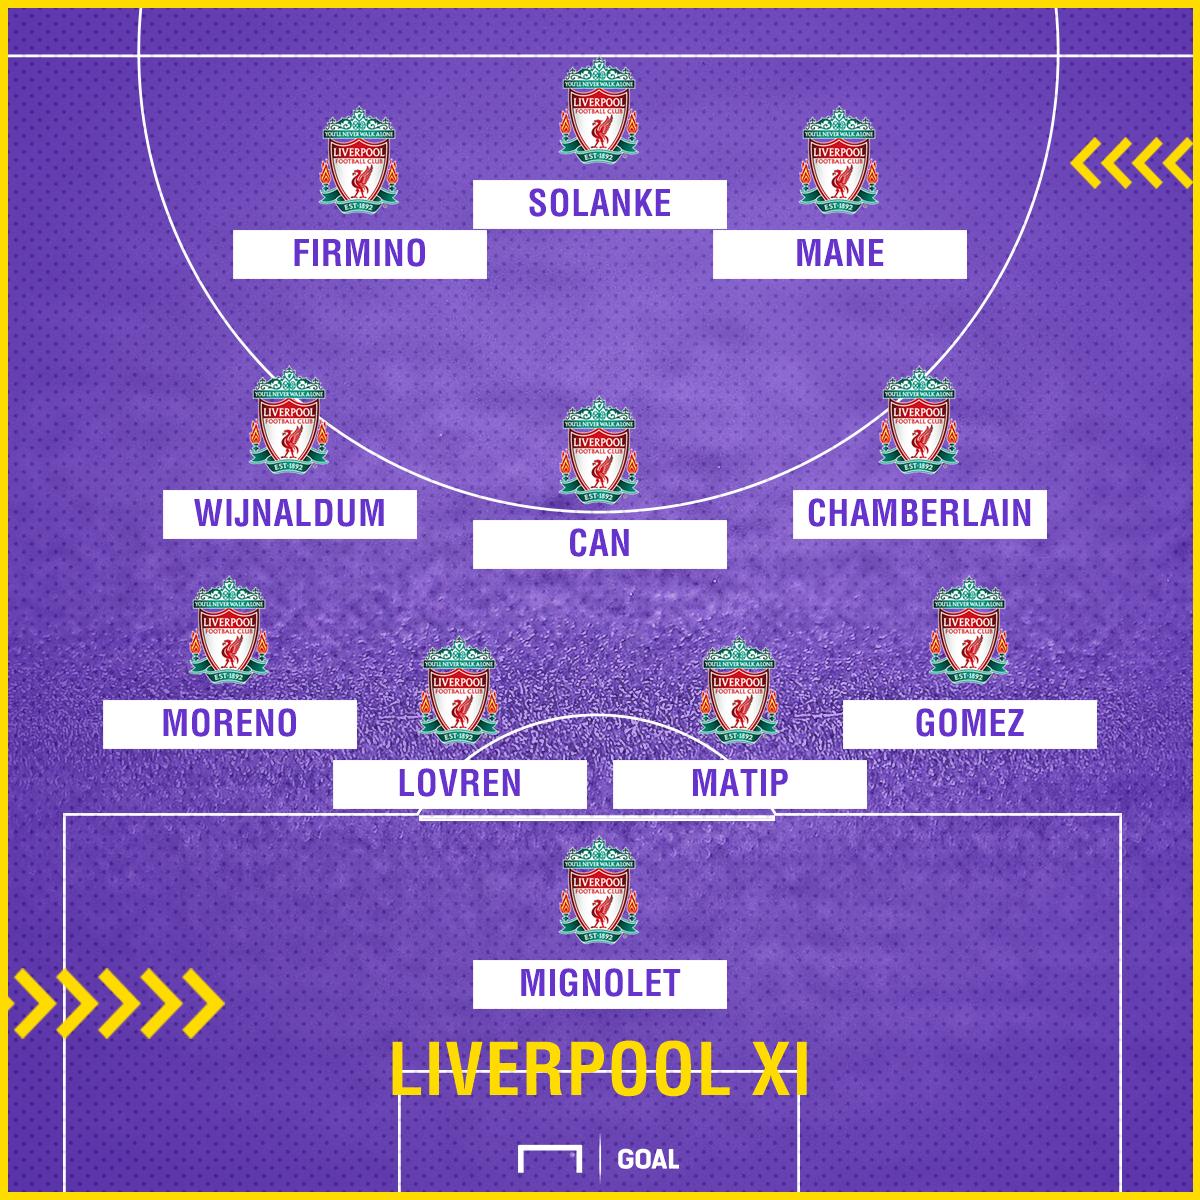 Liverpool XI GFX